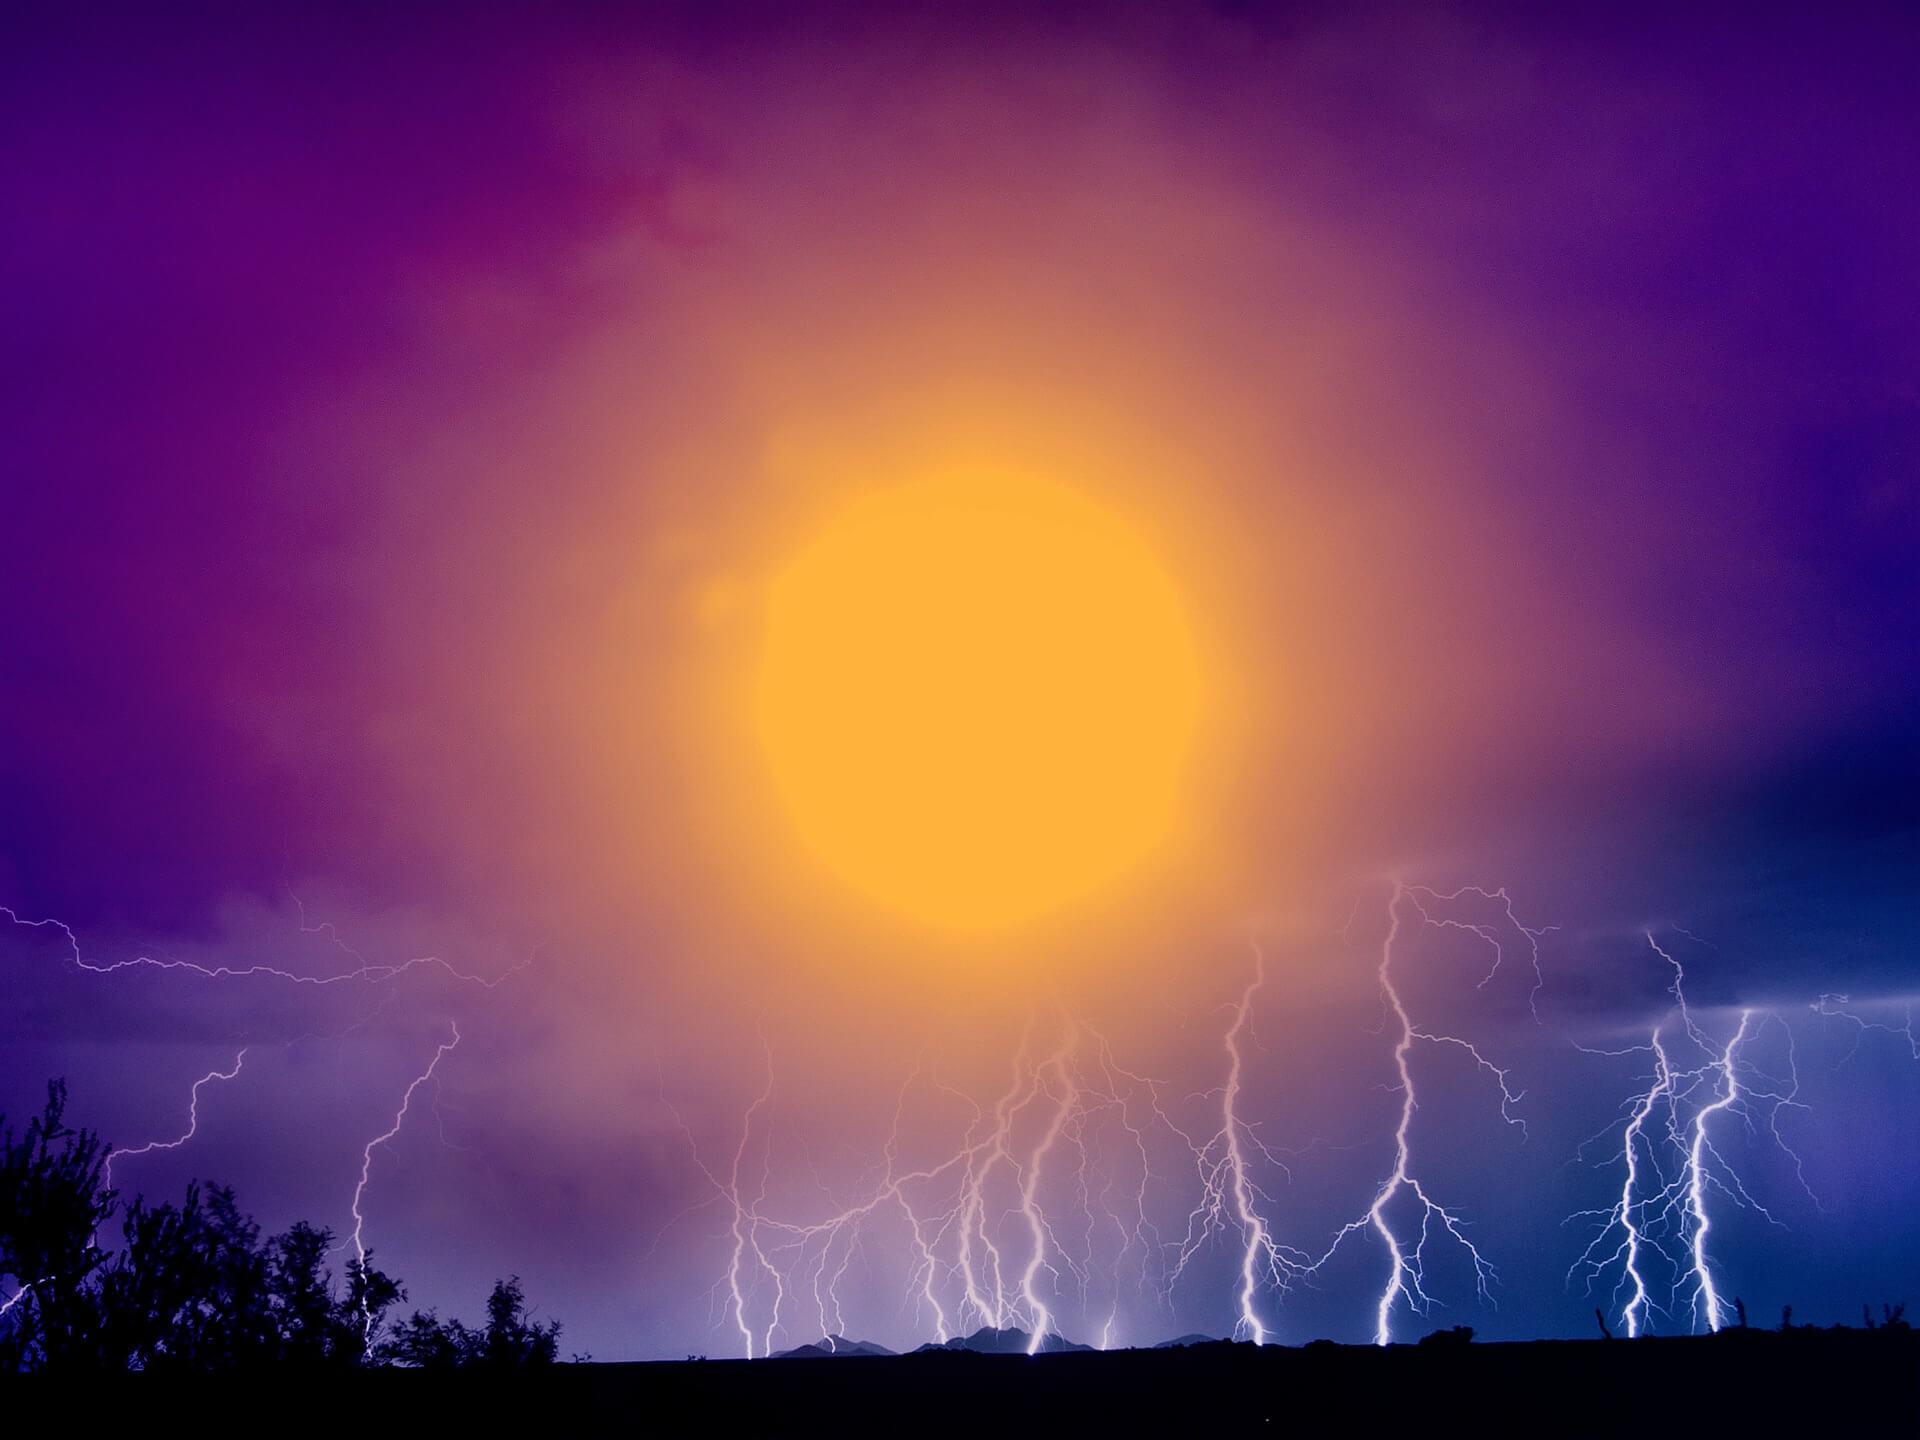 lightning safety, lightning safety tips, lightning security, Security Specialists Lighnting Safety, Security Specialists Lightning Security Tips, Security Specialists Lightning Safety Awareness